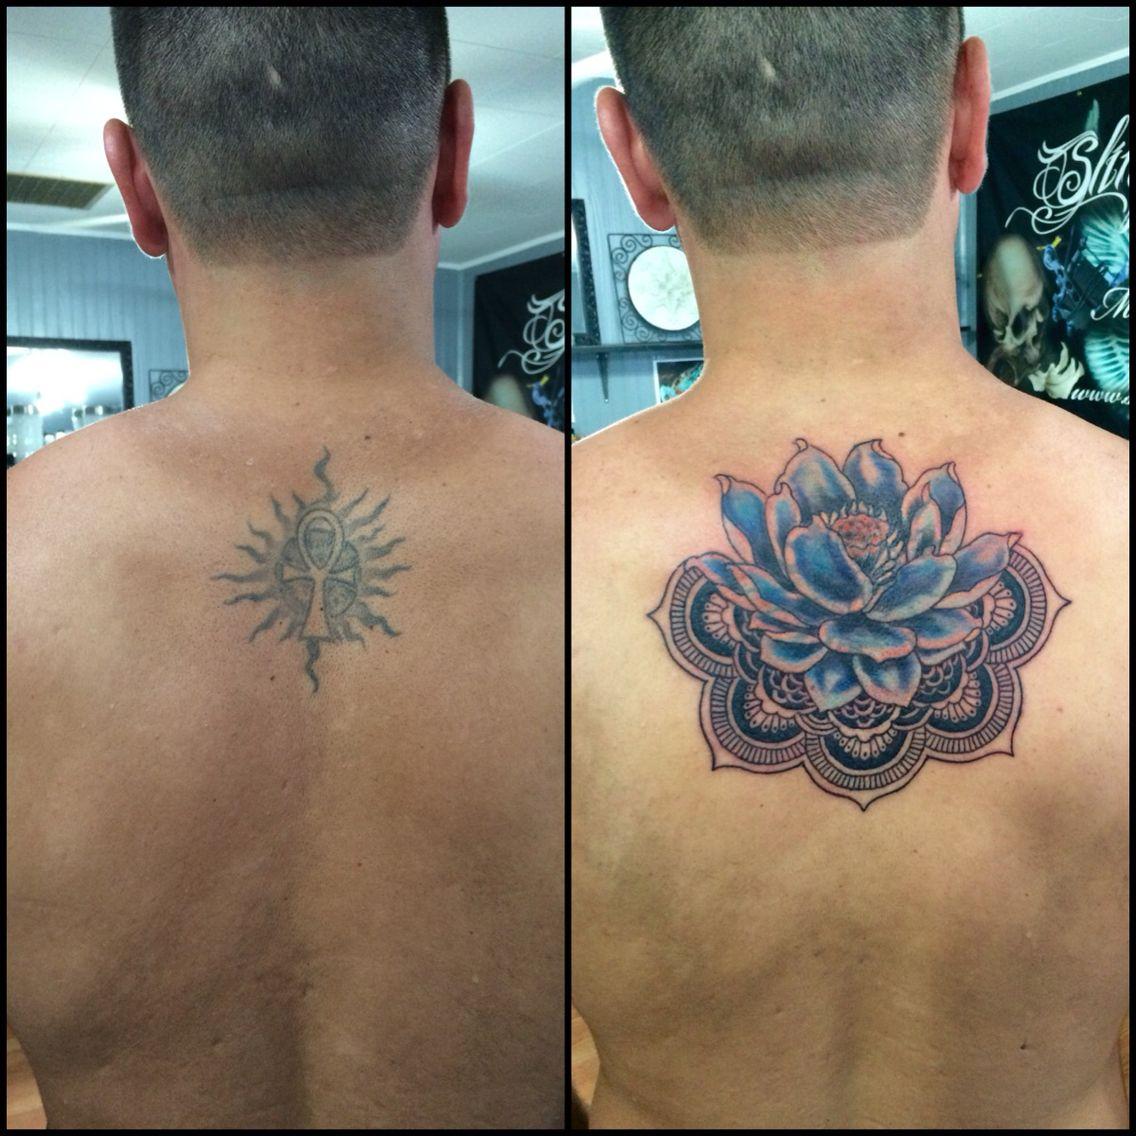 Tattoo Removal Arkansas